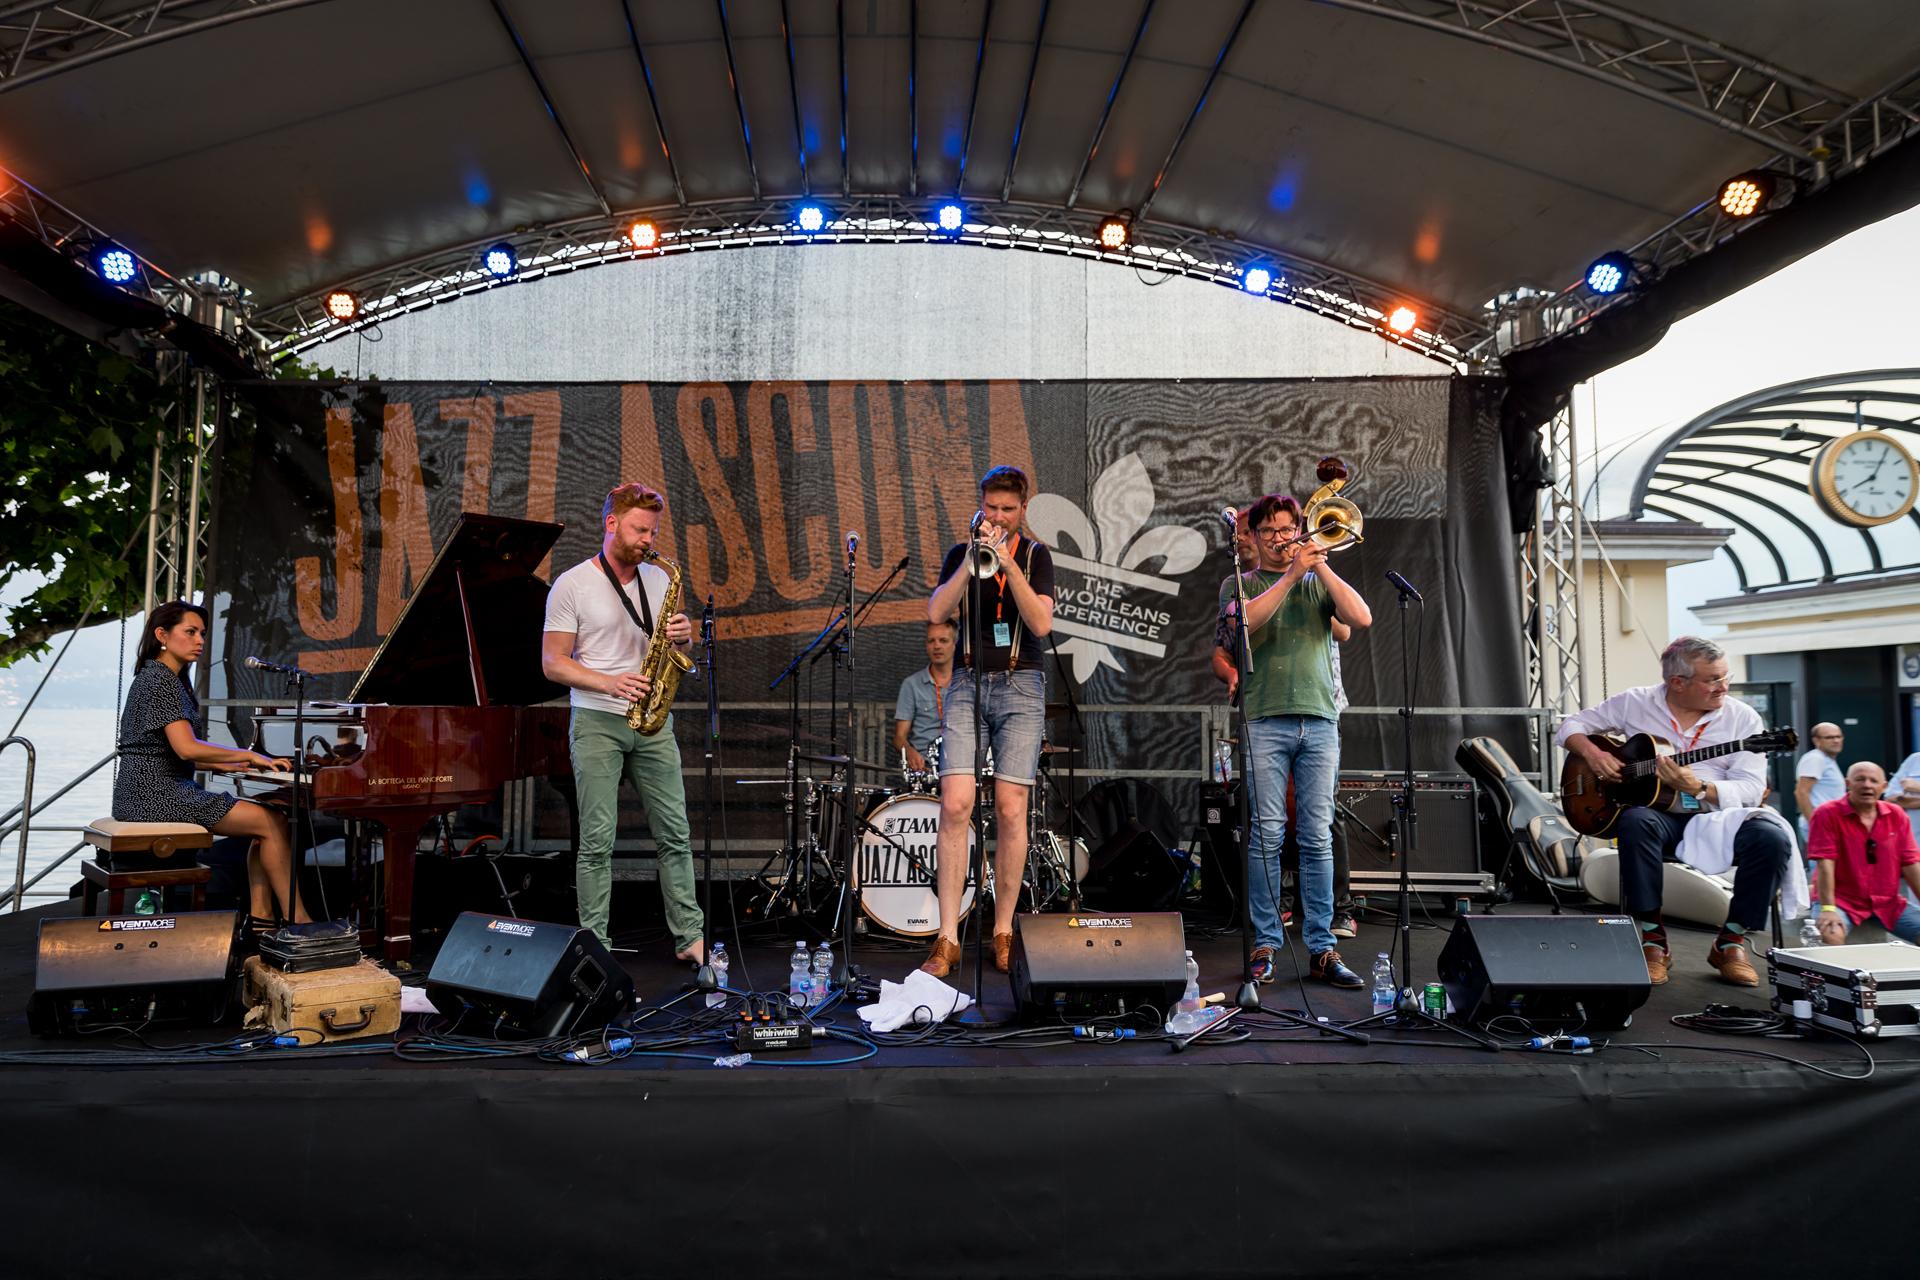 2019_06_28-Jazzascona-©-Luca-Vantusso-190616-5D4B8285